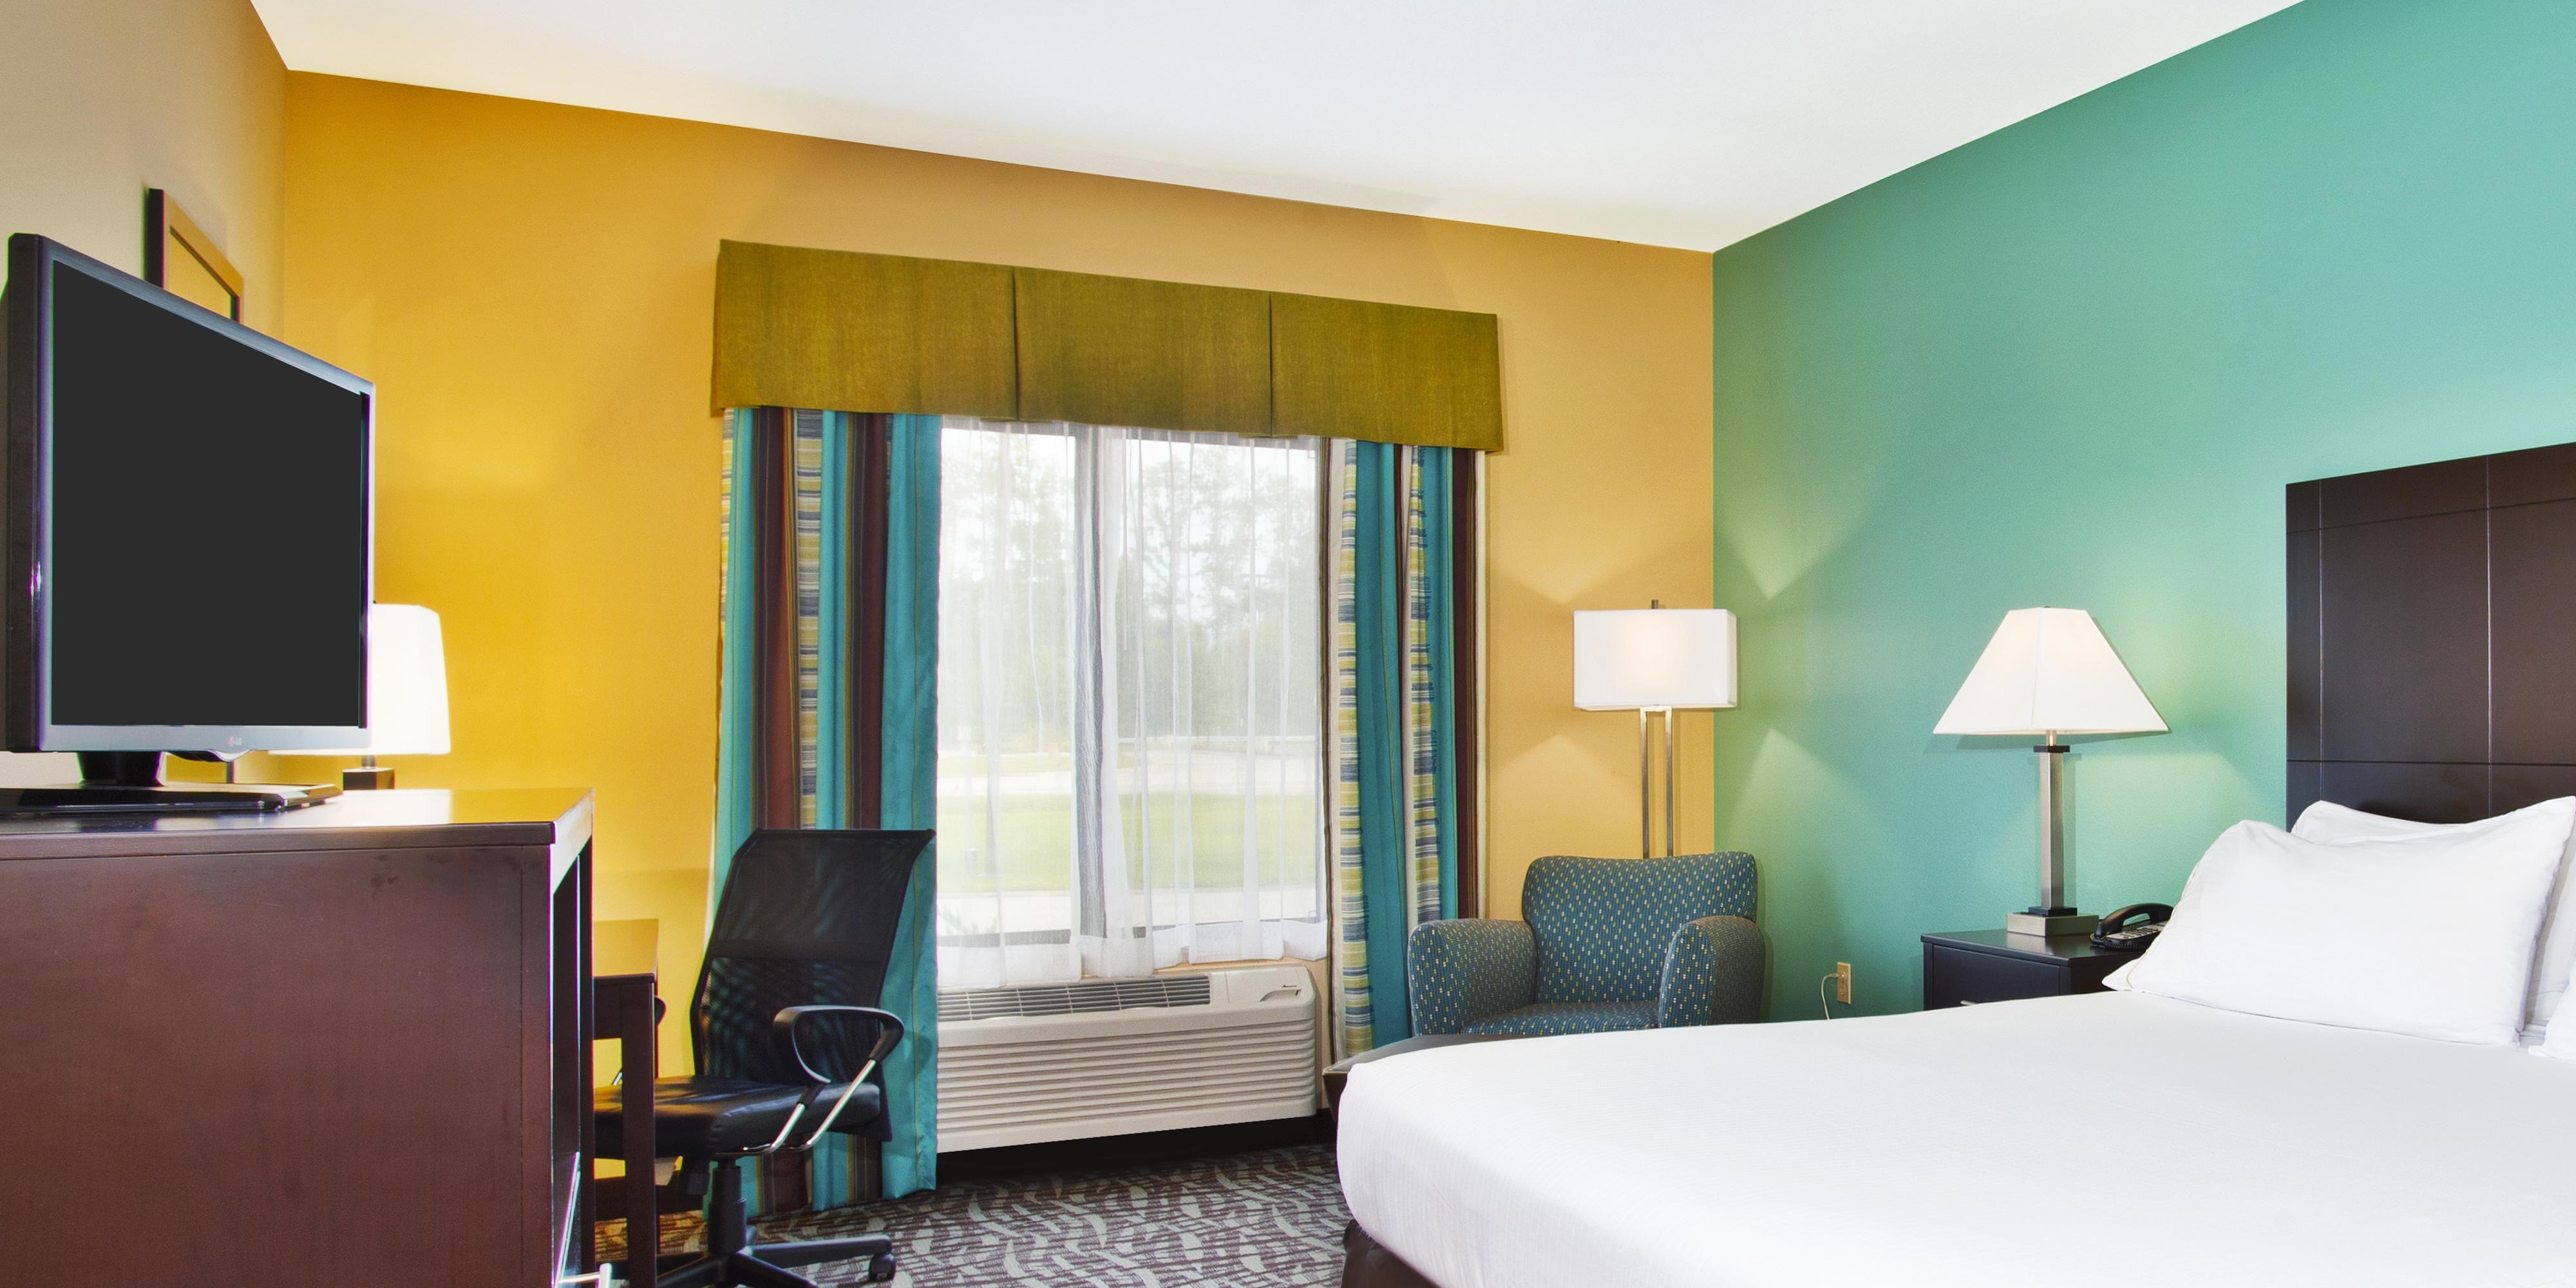 Holiday Inn Express Hastings 4150027184 2x1